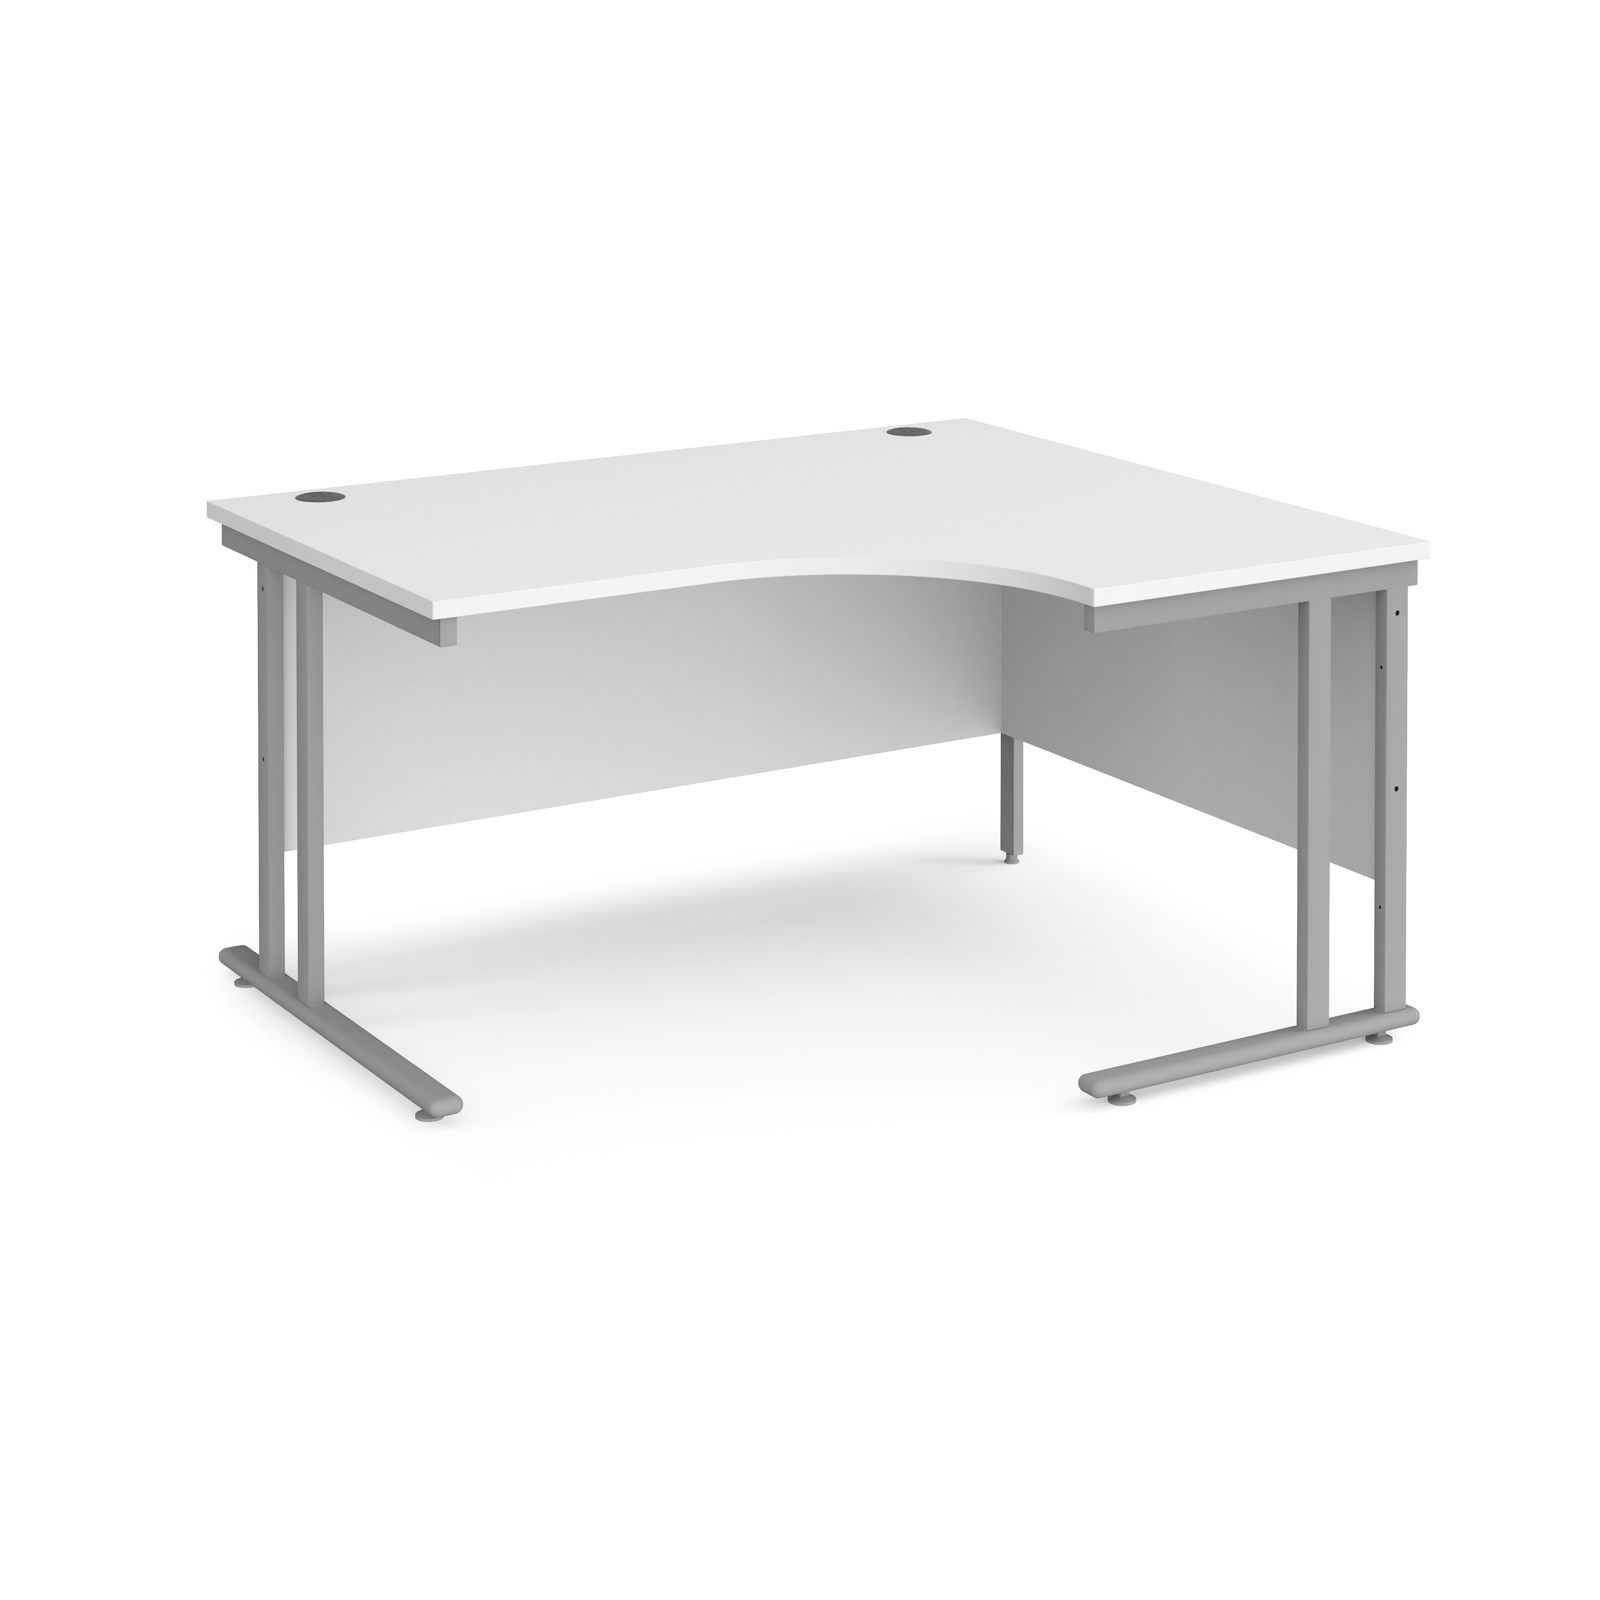 Right Handed Maestro 25 right hand ergonomic desk 1400mm wide - silver cantilever leg frame, white top